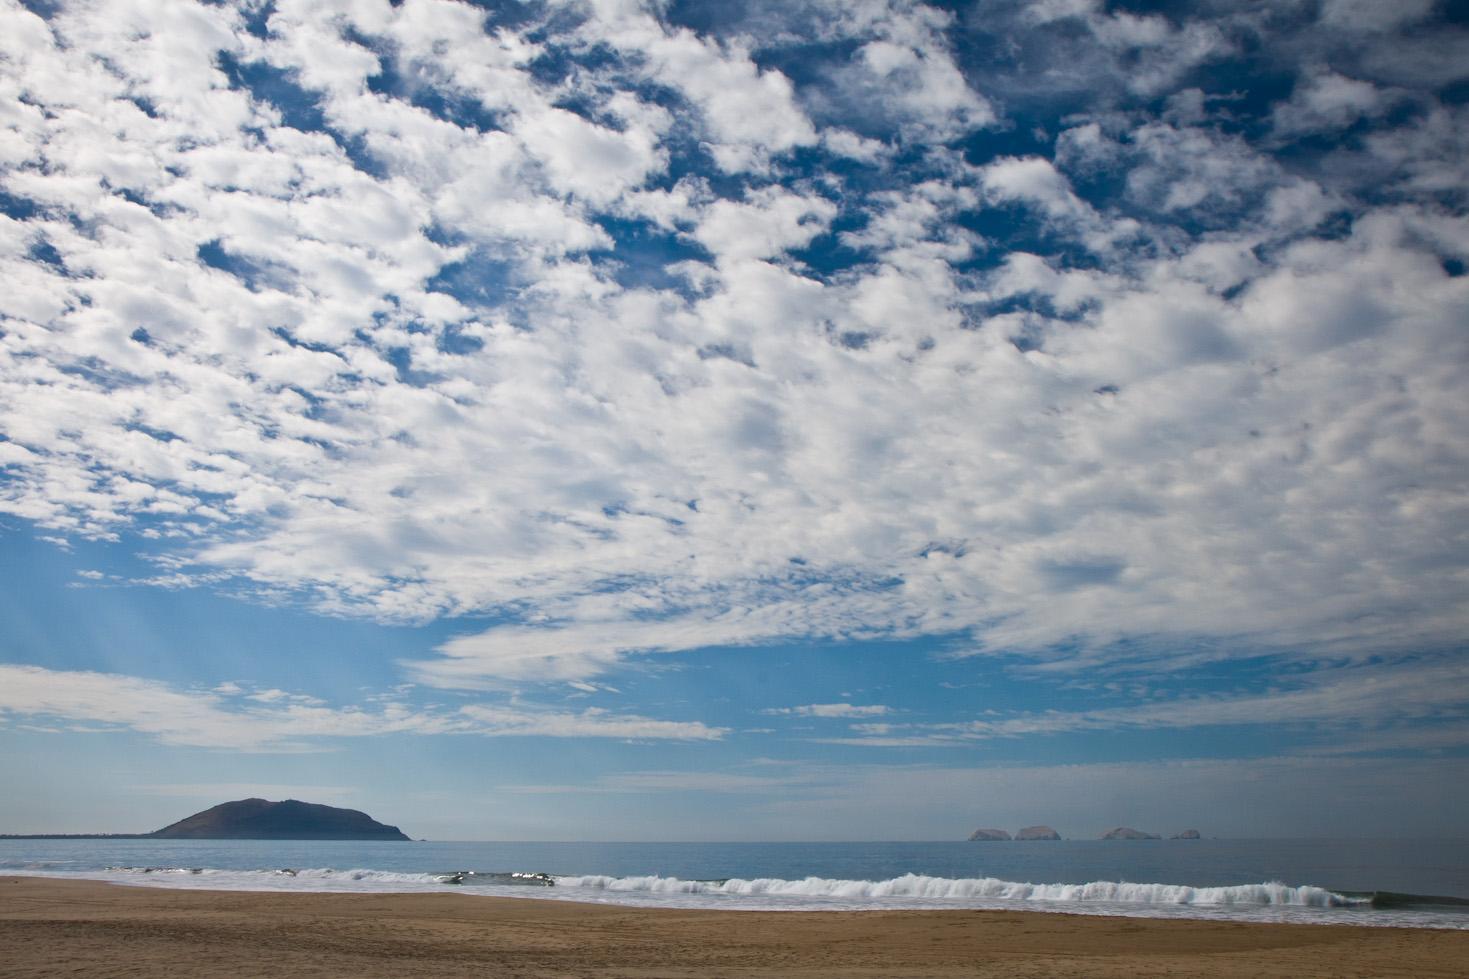 playa blanca south